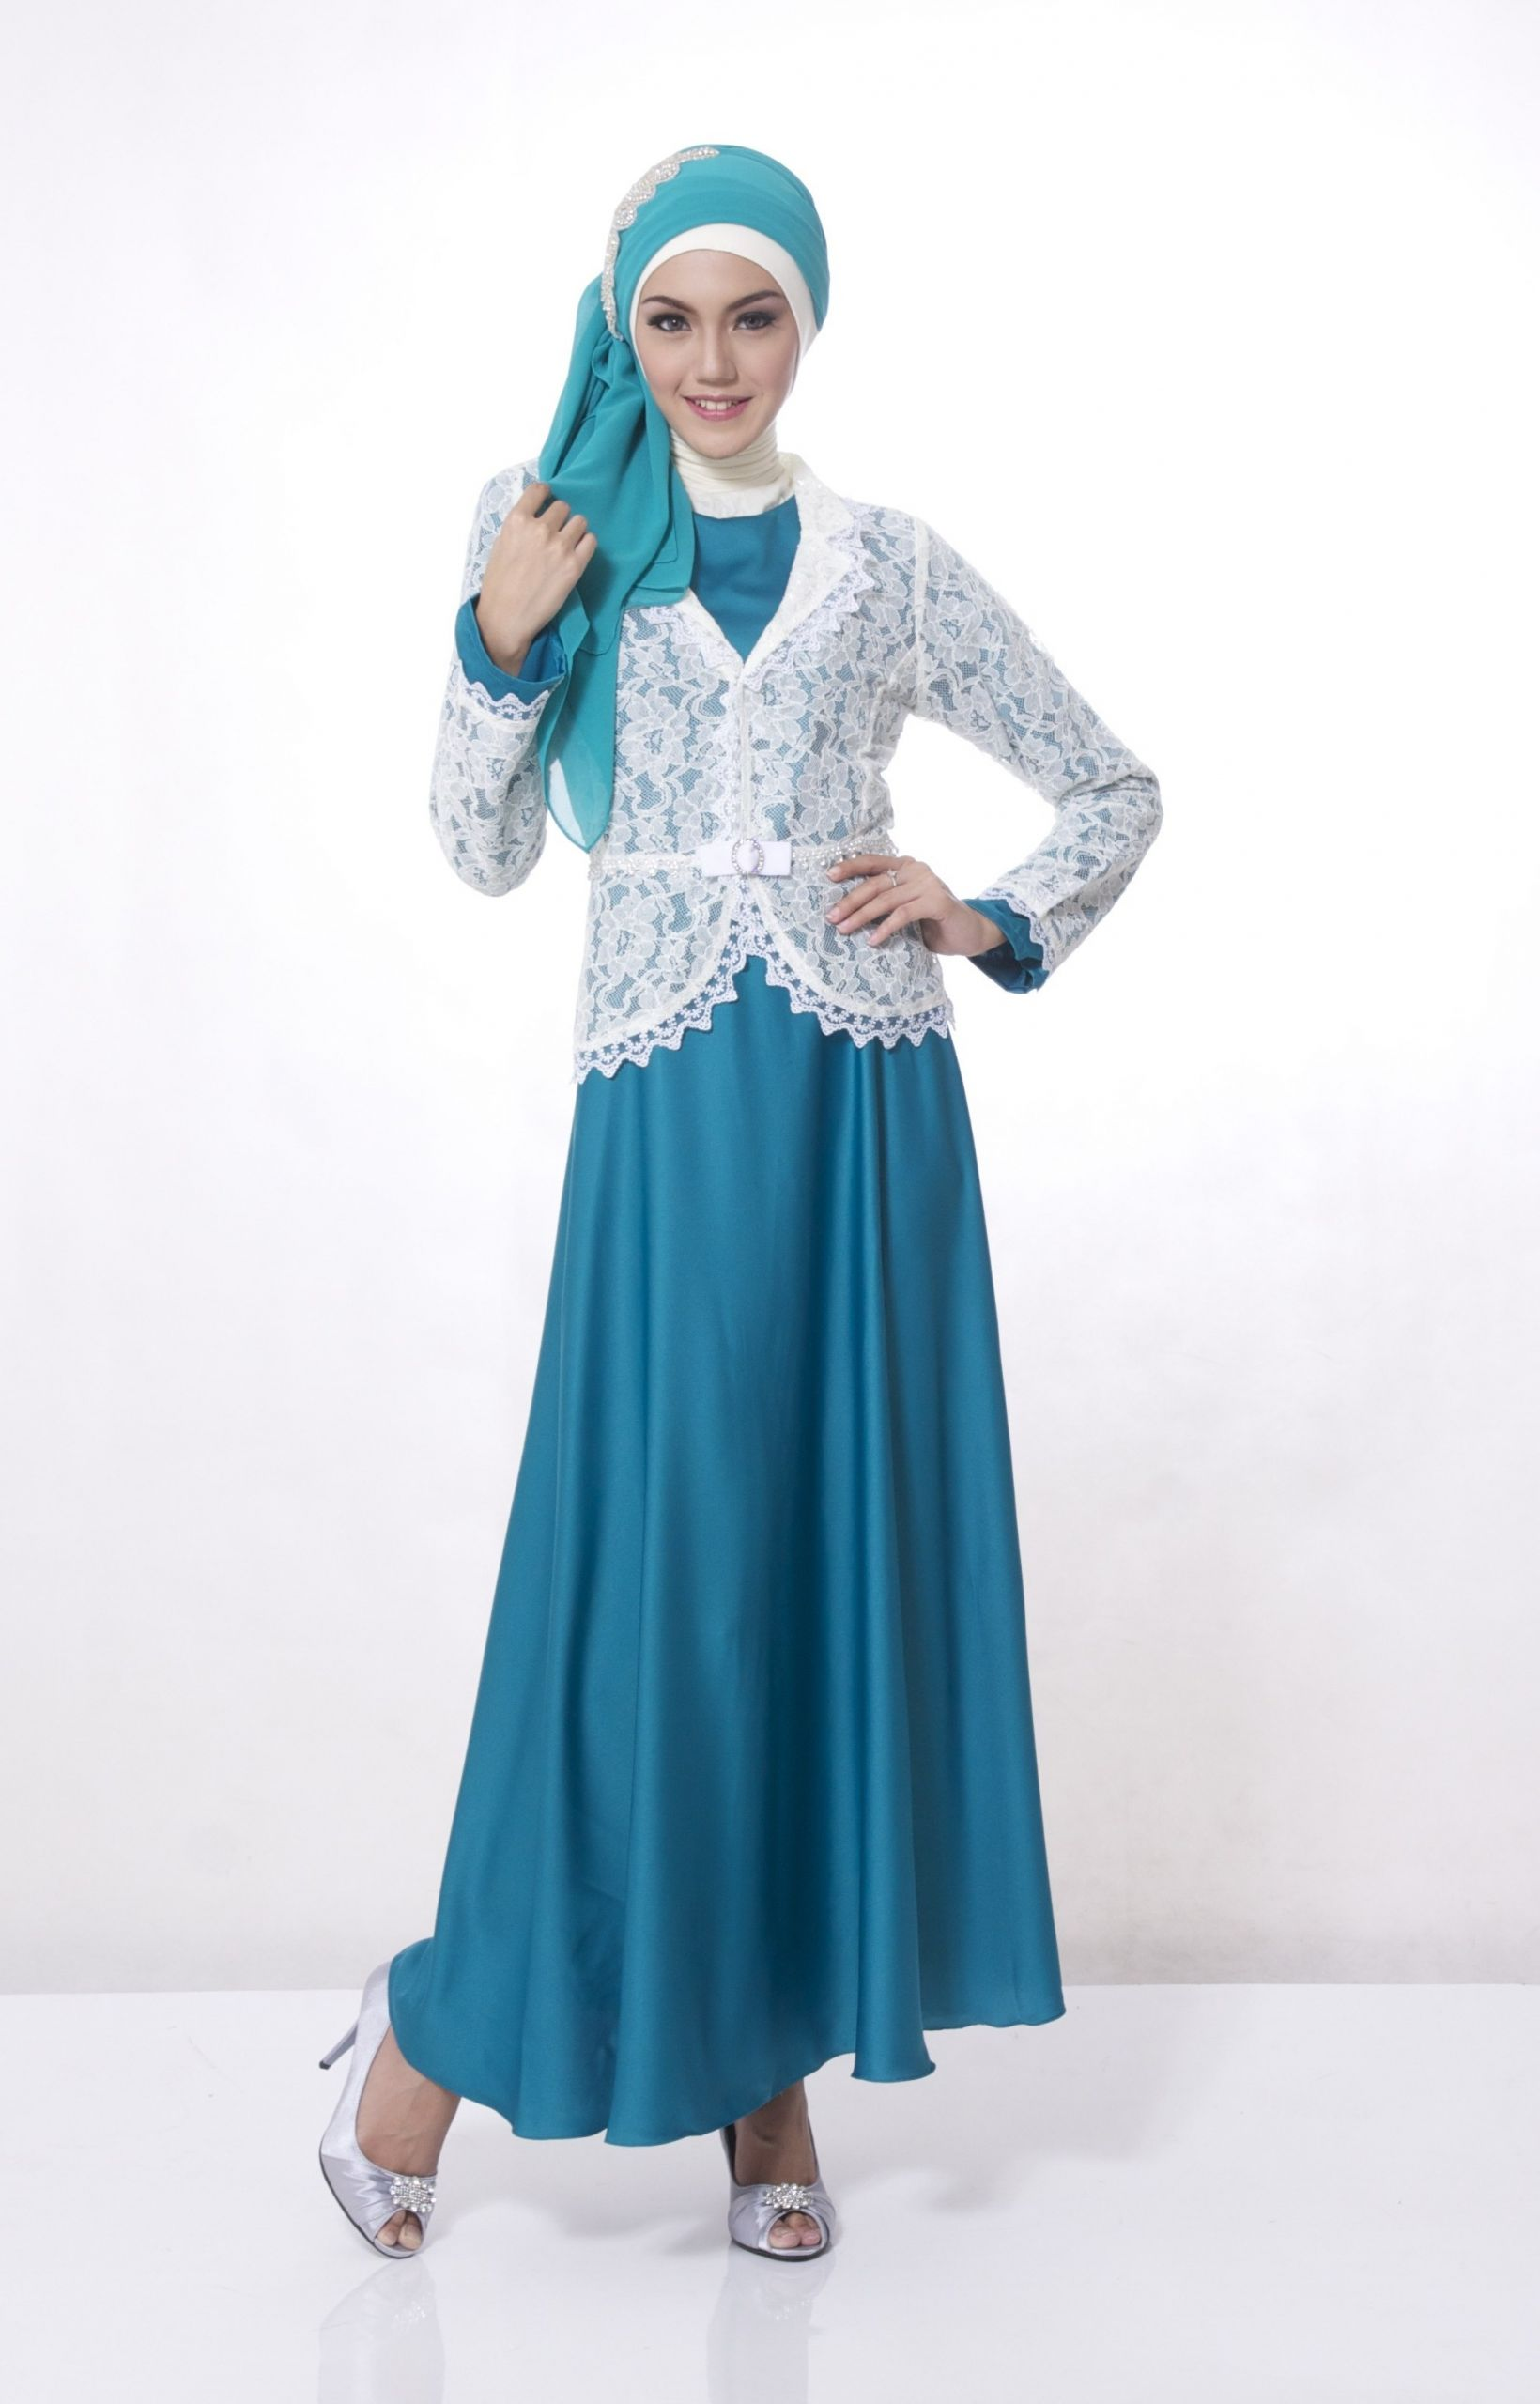 Model Desain Baju Lebaran Xtd6 Contoh Desain Baju Muslim Terbaru Di 2015 – Pipitfashion